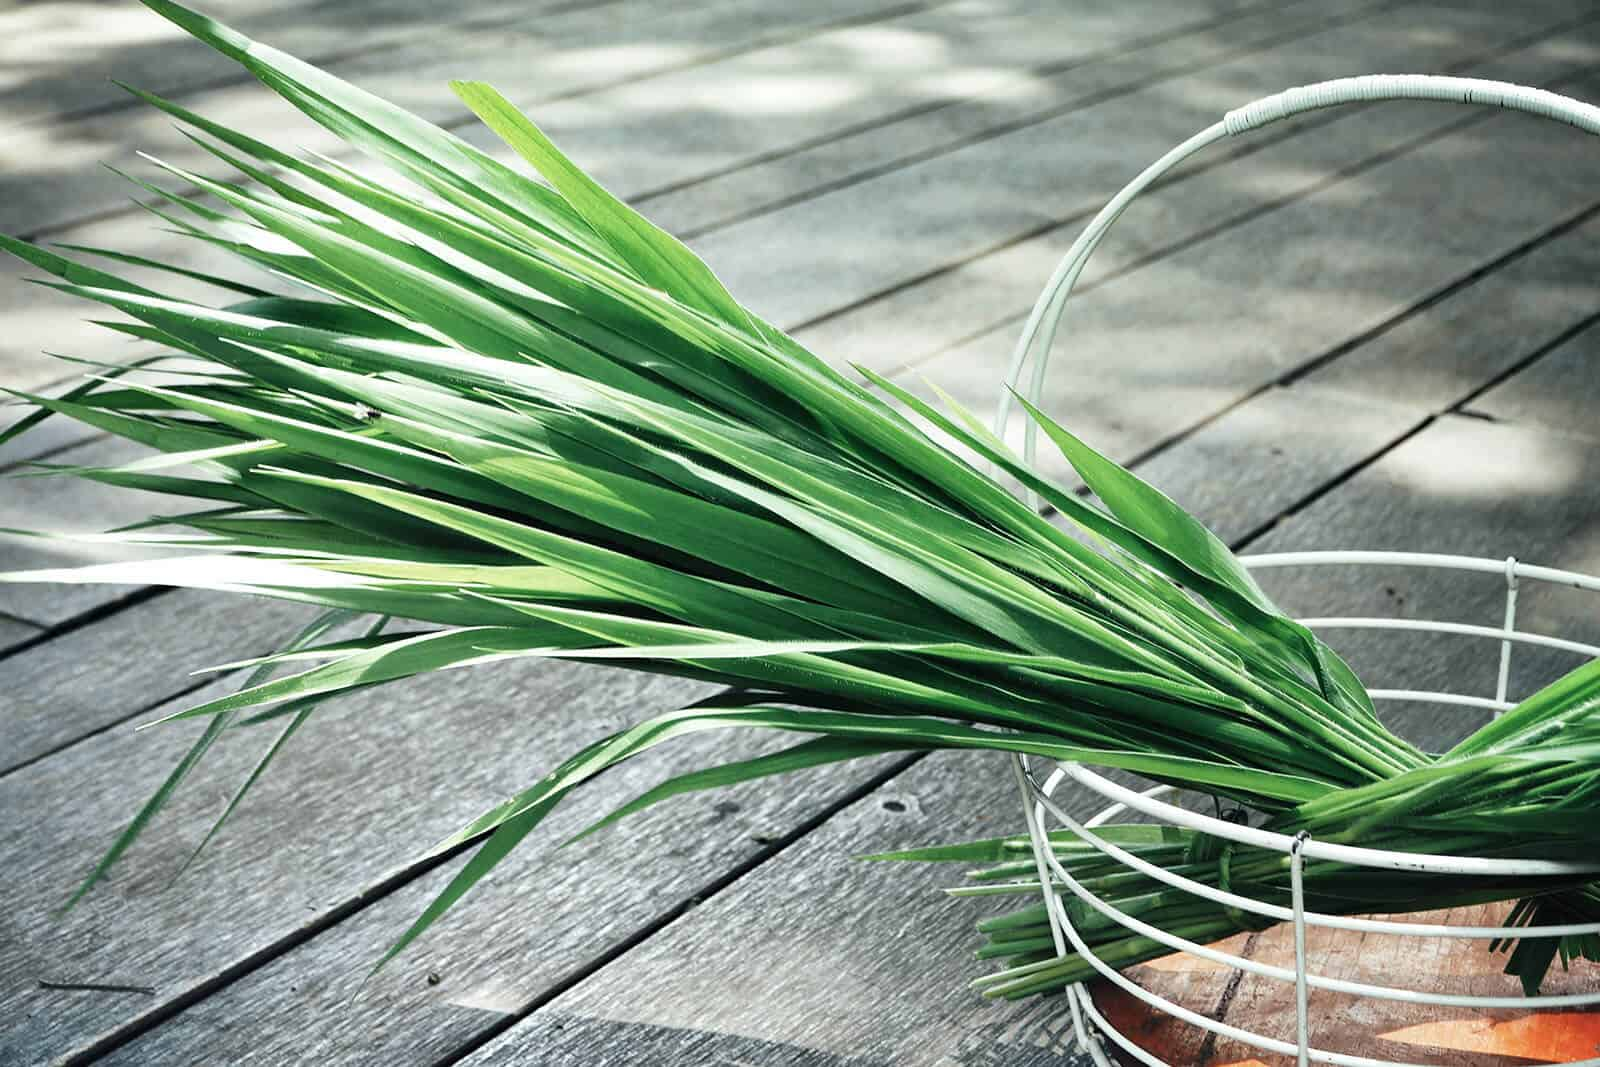 wellnessaromas-aromatherapy-essential-oil_vetiver-benefits-uses